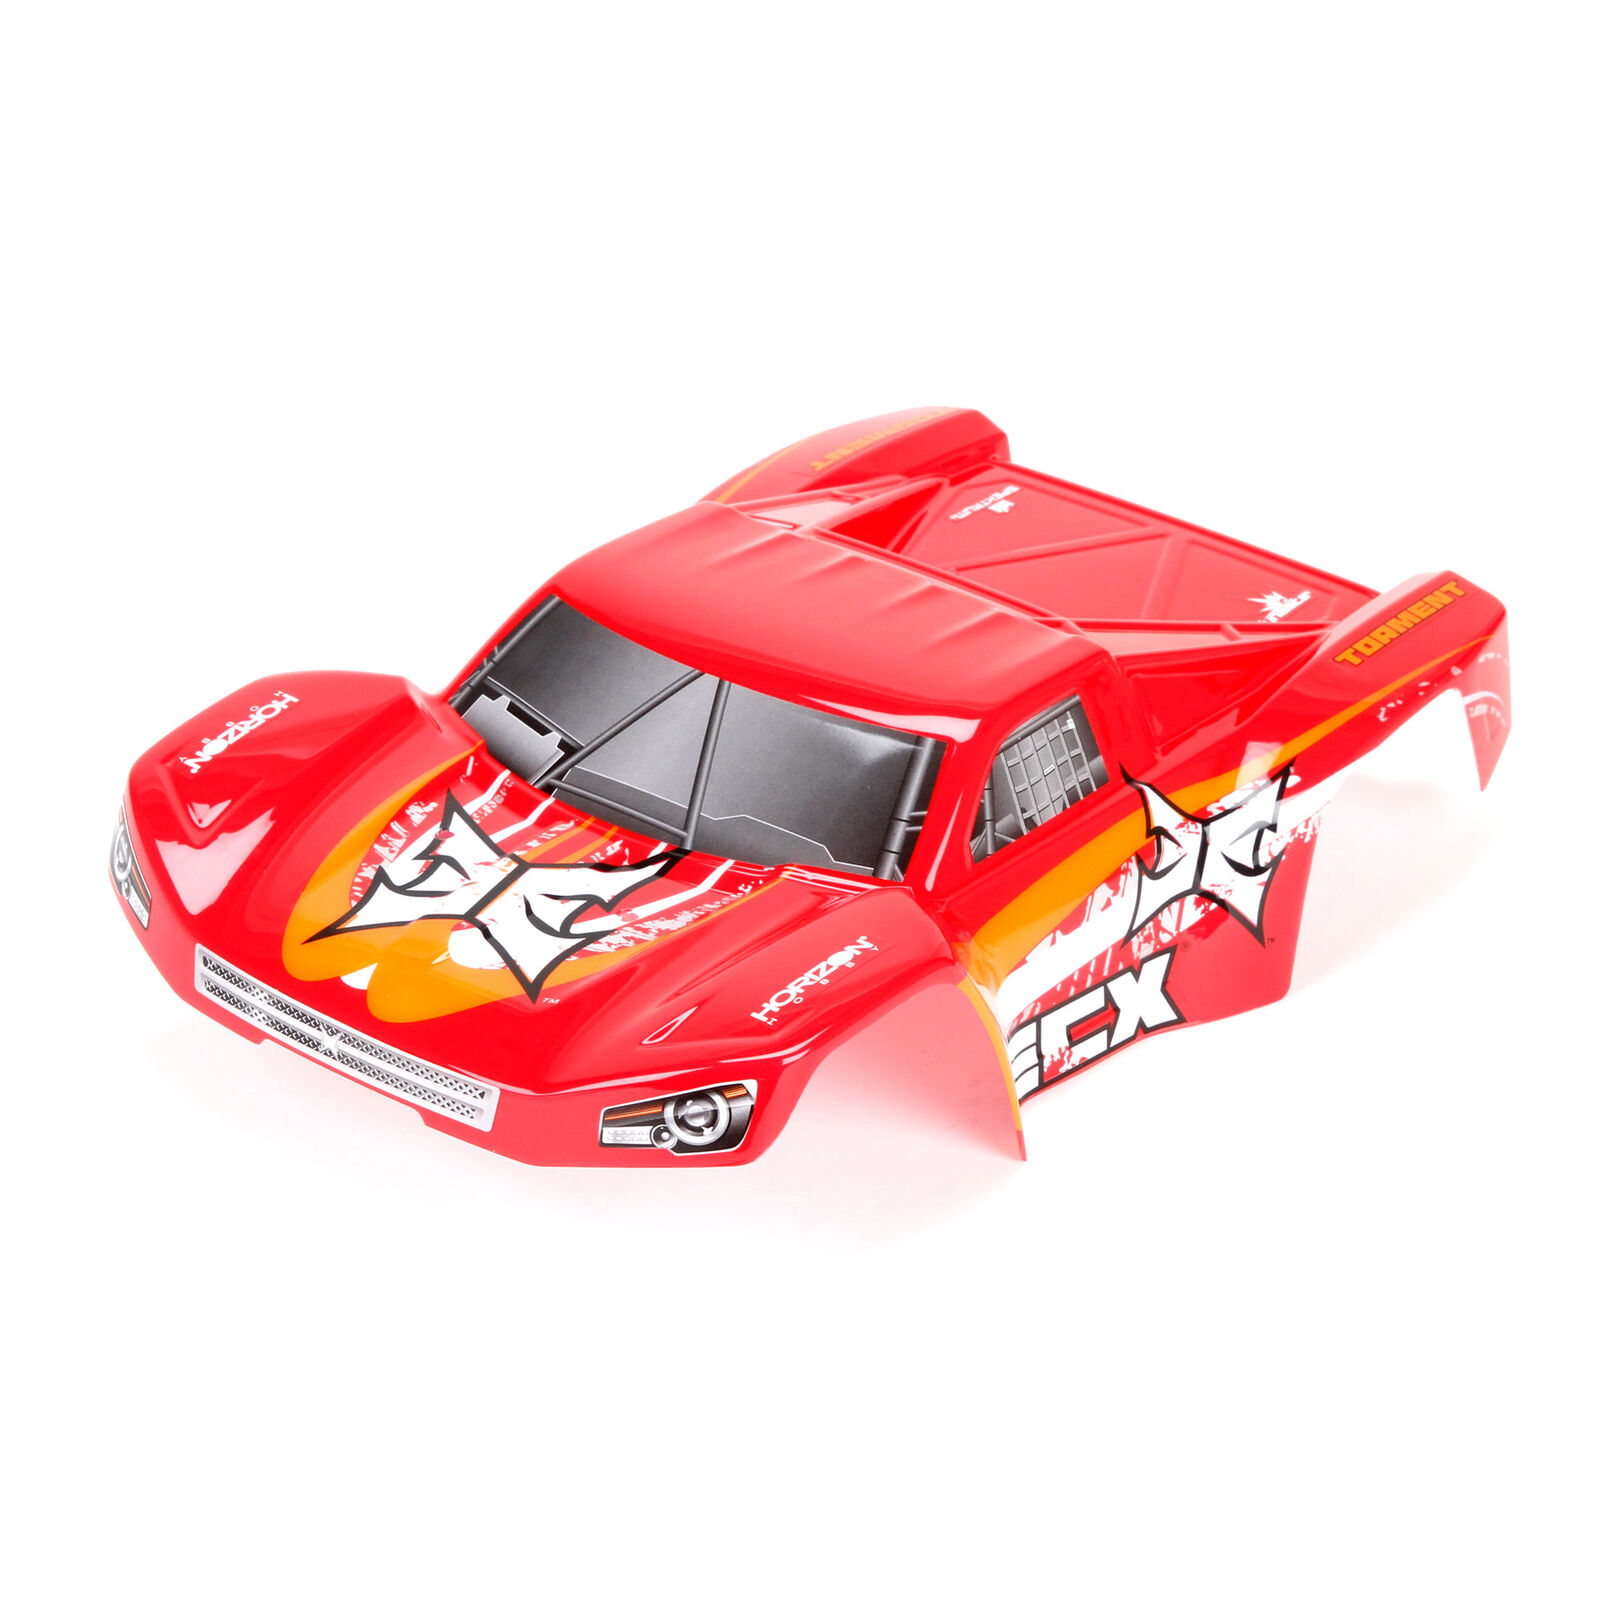 1/18 Painted Body Set, Red/Orange: 4WD Ruckus